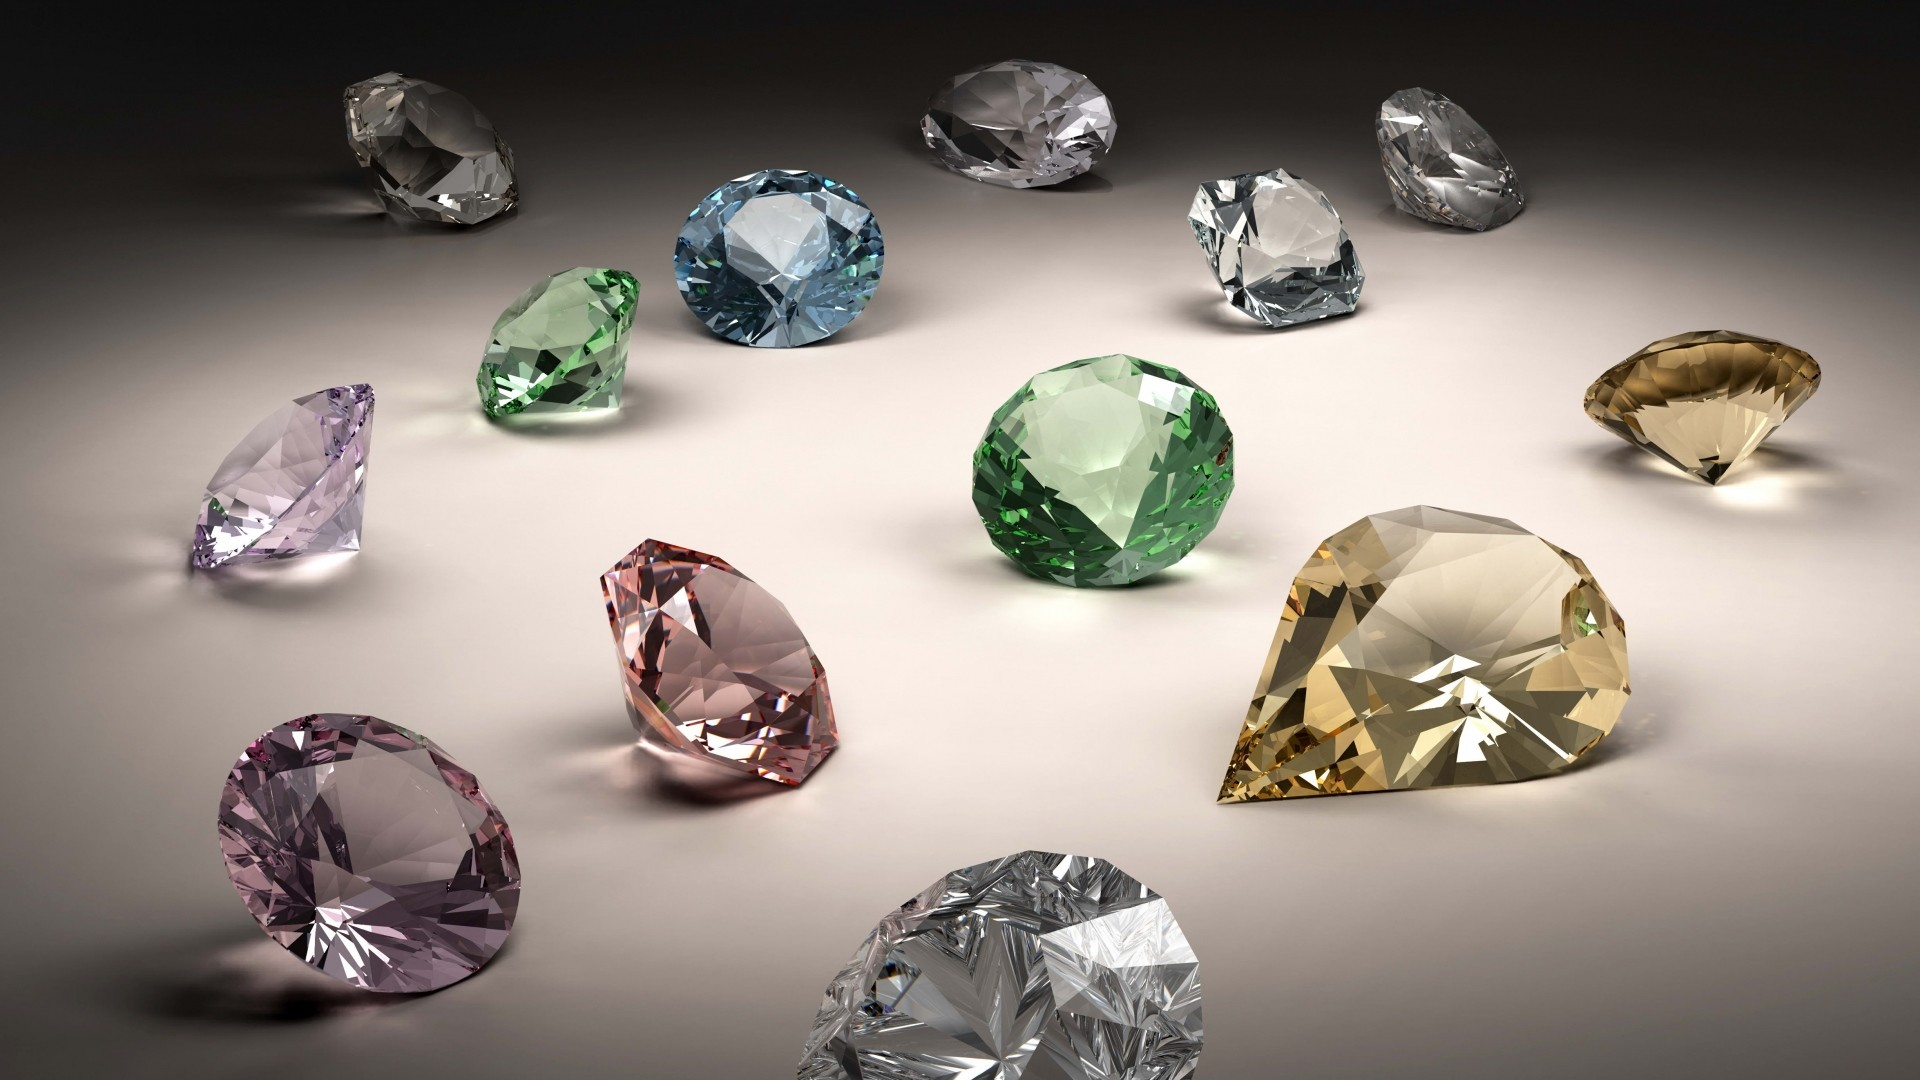 Download Wallpaper Stones, Jewels, Diamonds Full HD 1080p HD  Background